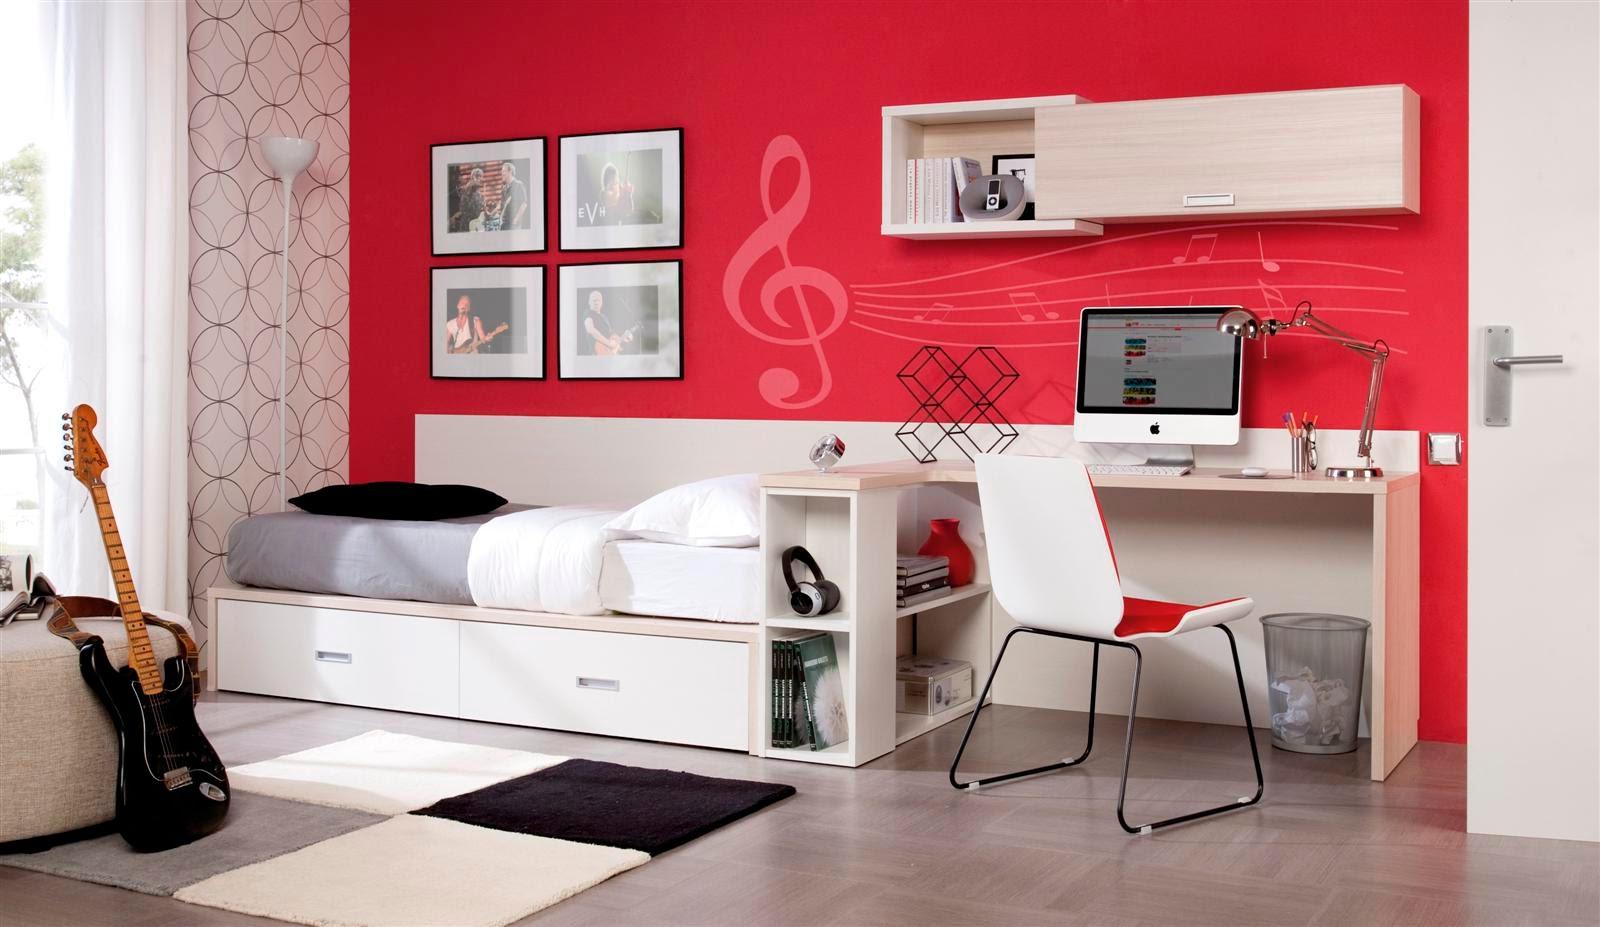 Decora tu hogar de acuerdo a tu gusto Musical 2